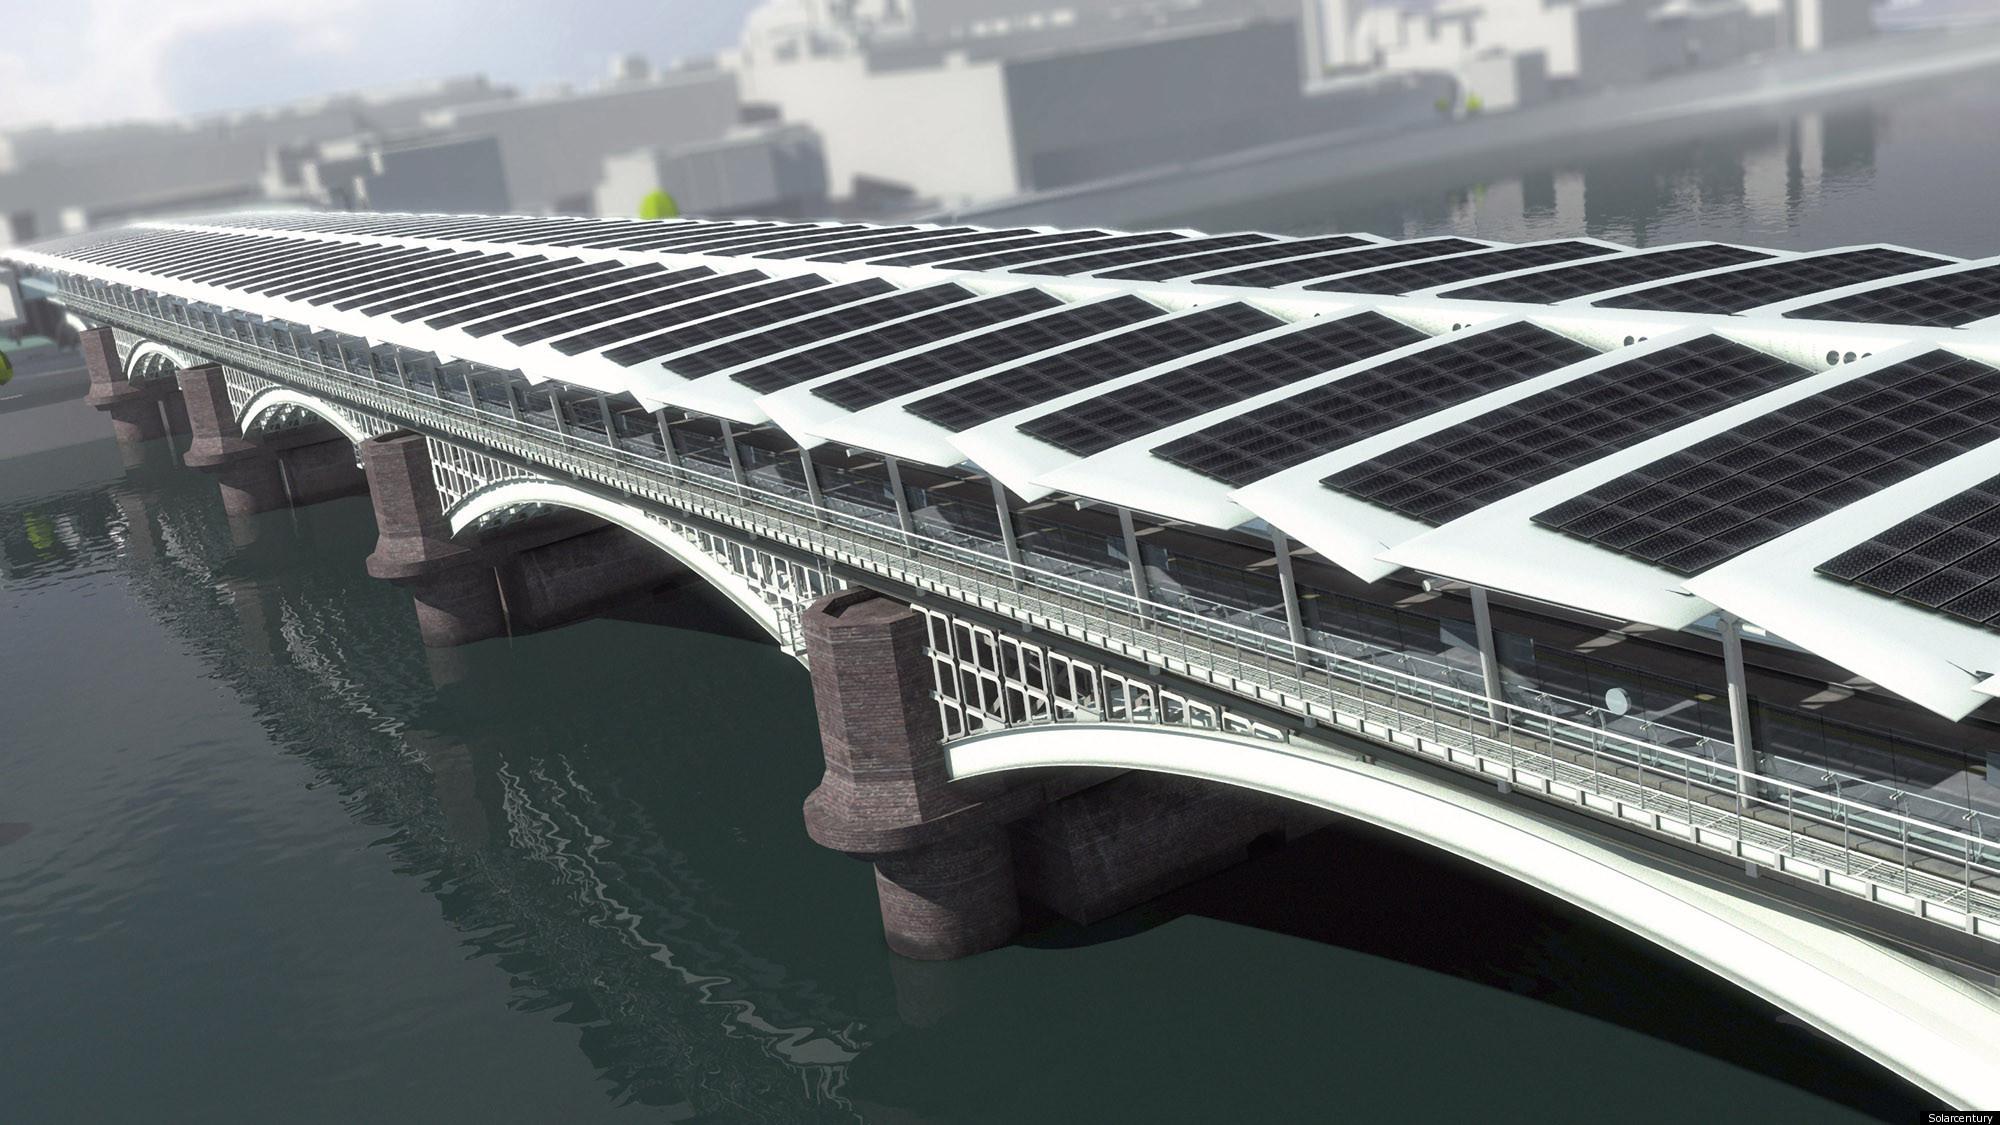 Blackfriars Bridge Victorian London Landmark To Receive